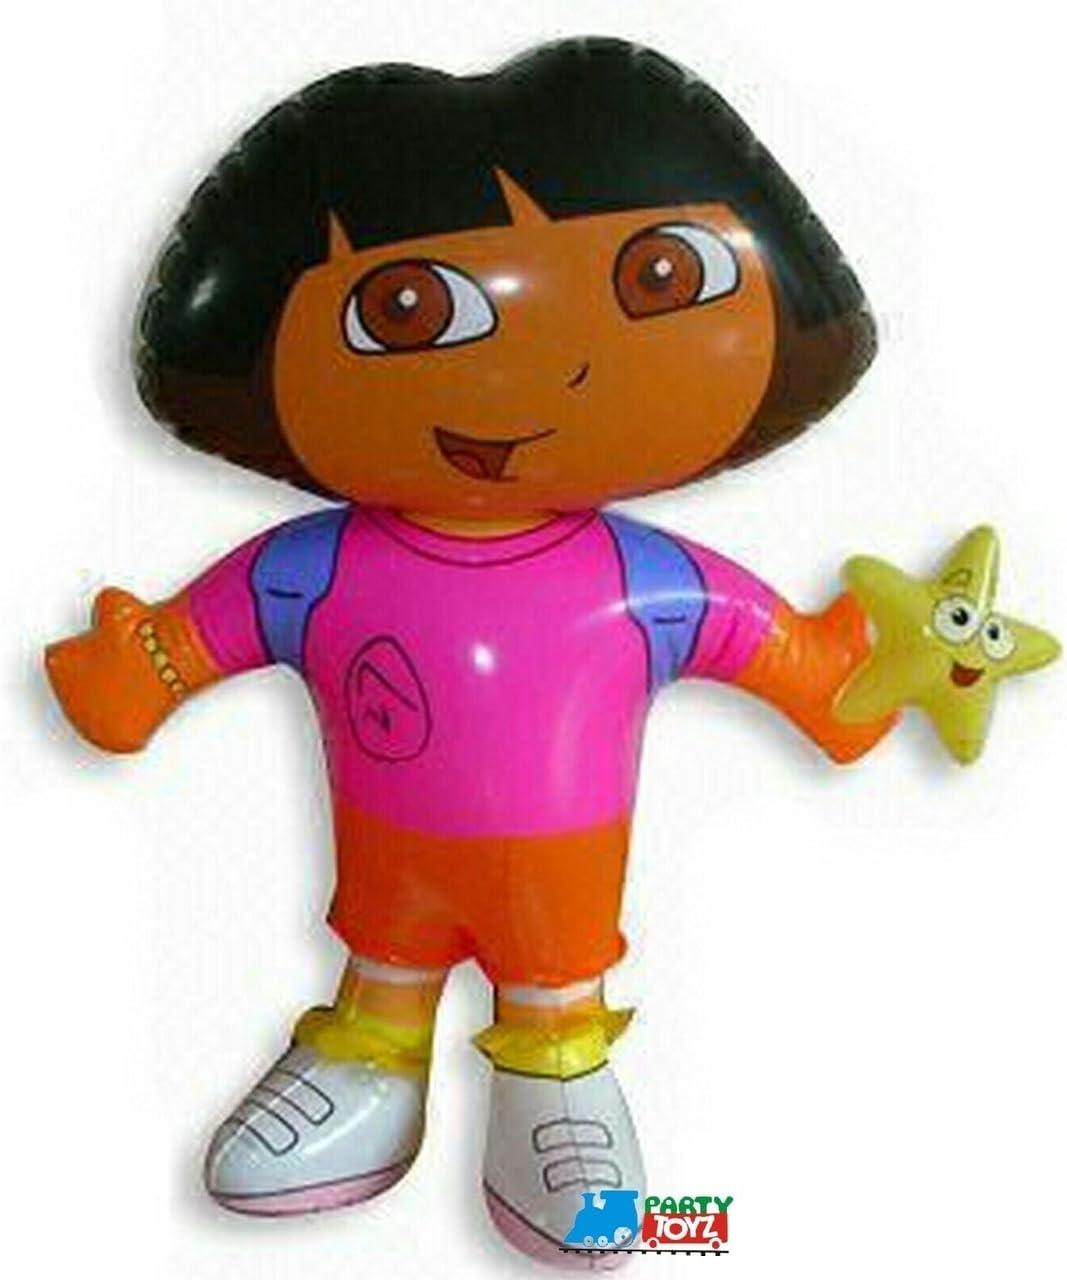 Dora the Explorer Novelty Plastic Credit Card